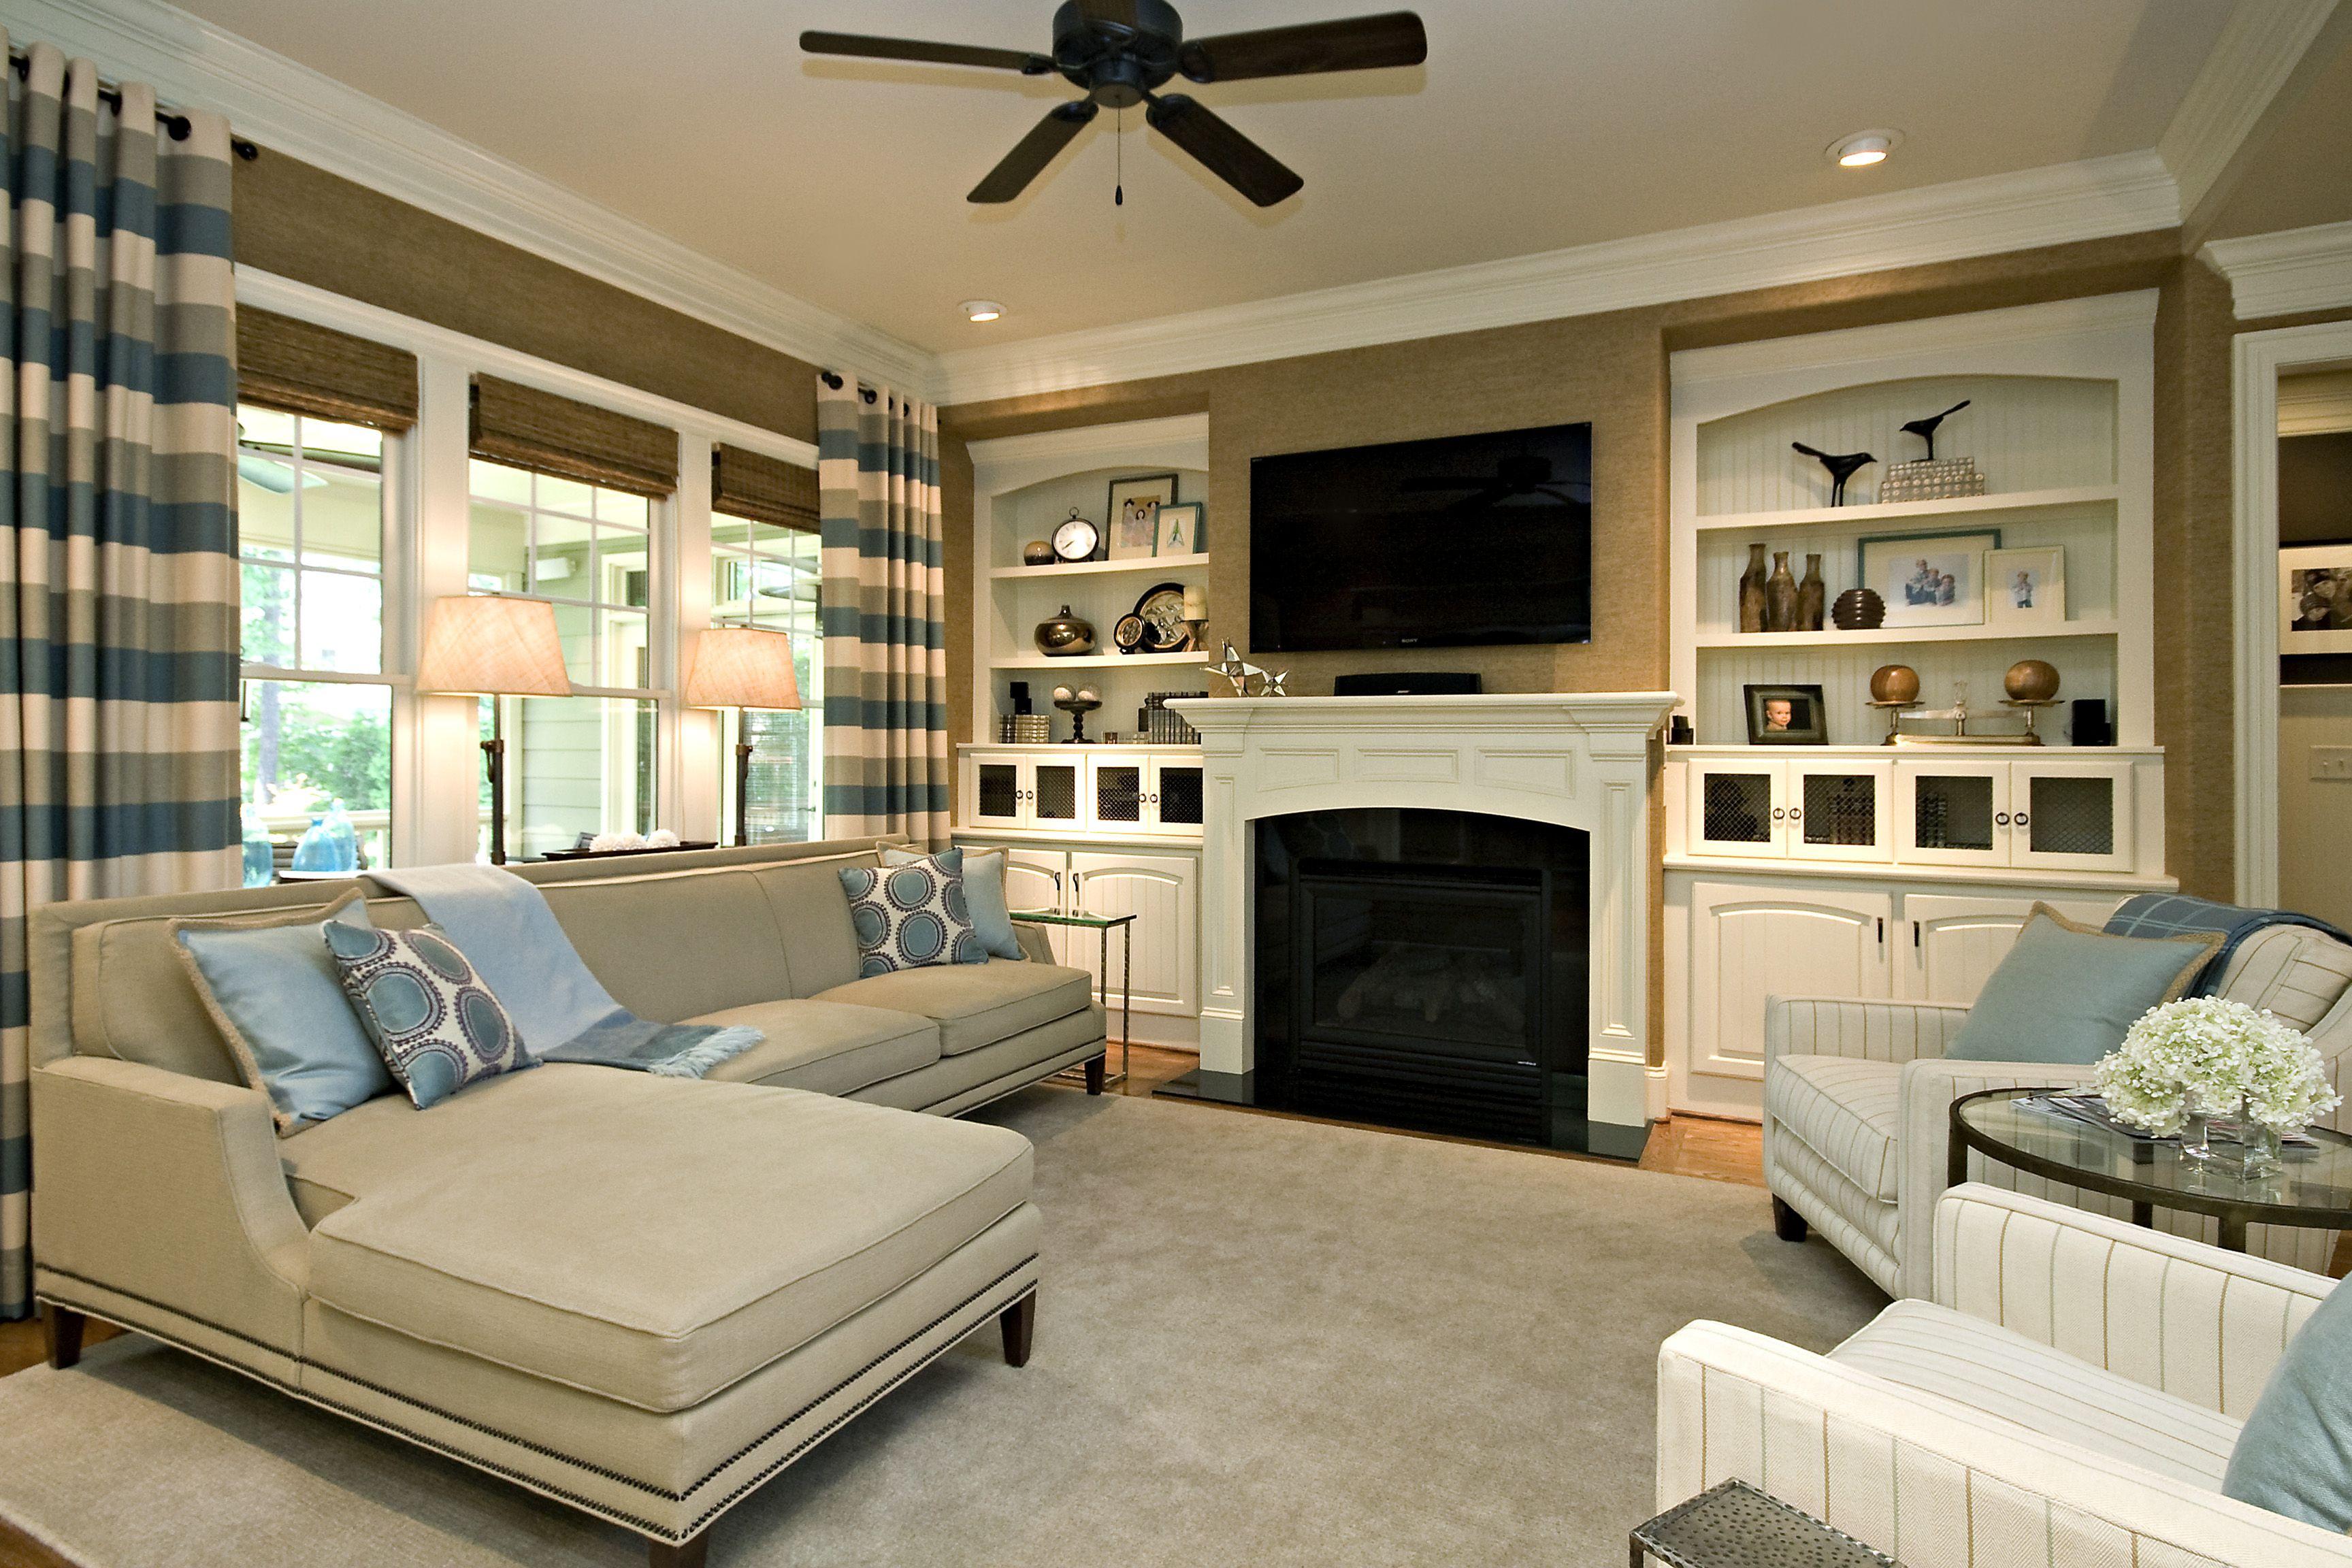 Modern family living room bonus room ideas  driggs designs  interior design raleigh nc